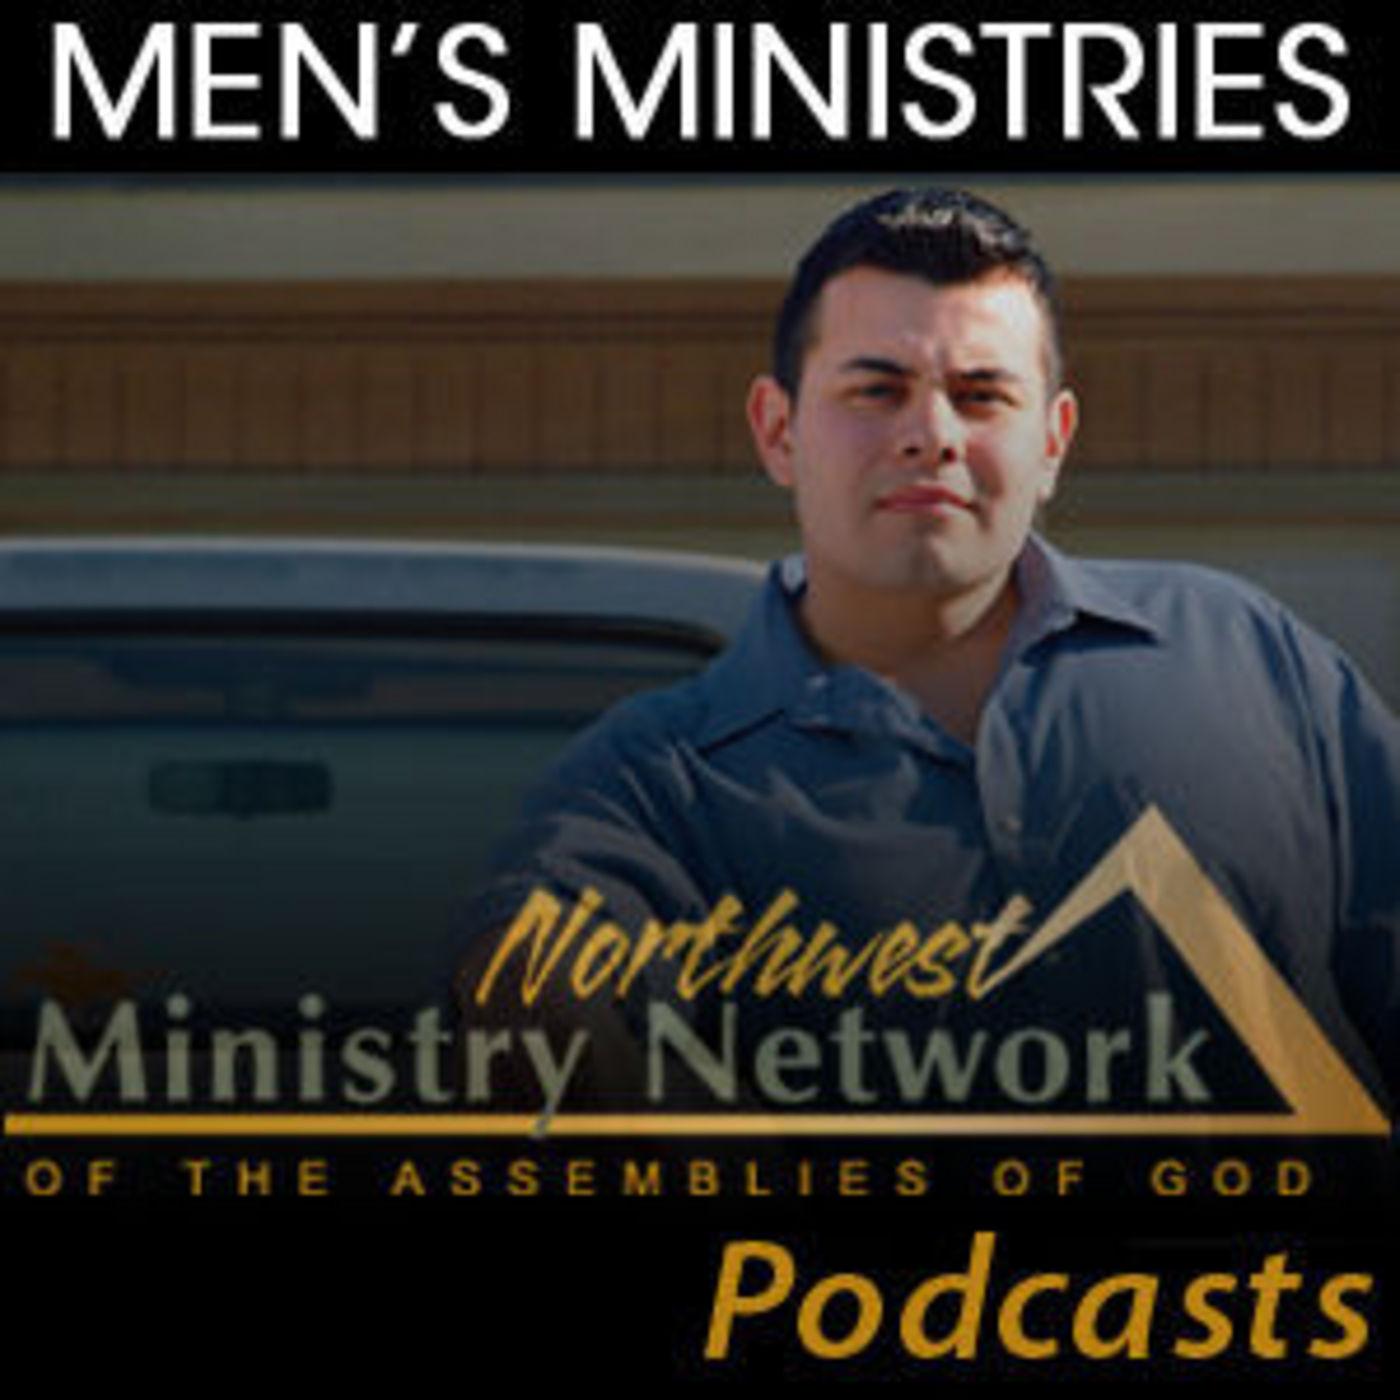 <![CDATA[NMWN Men's Ministries]]>